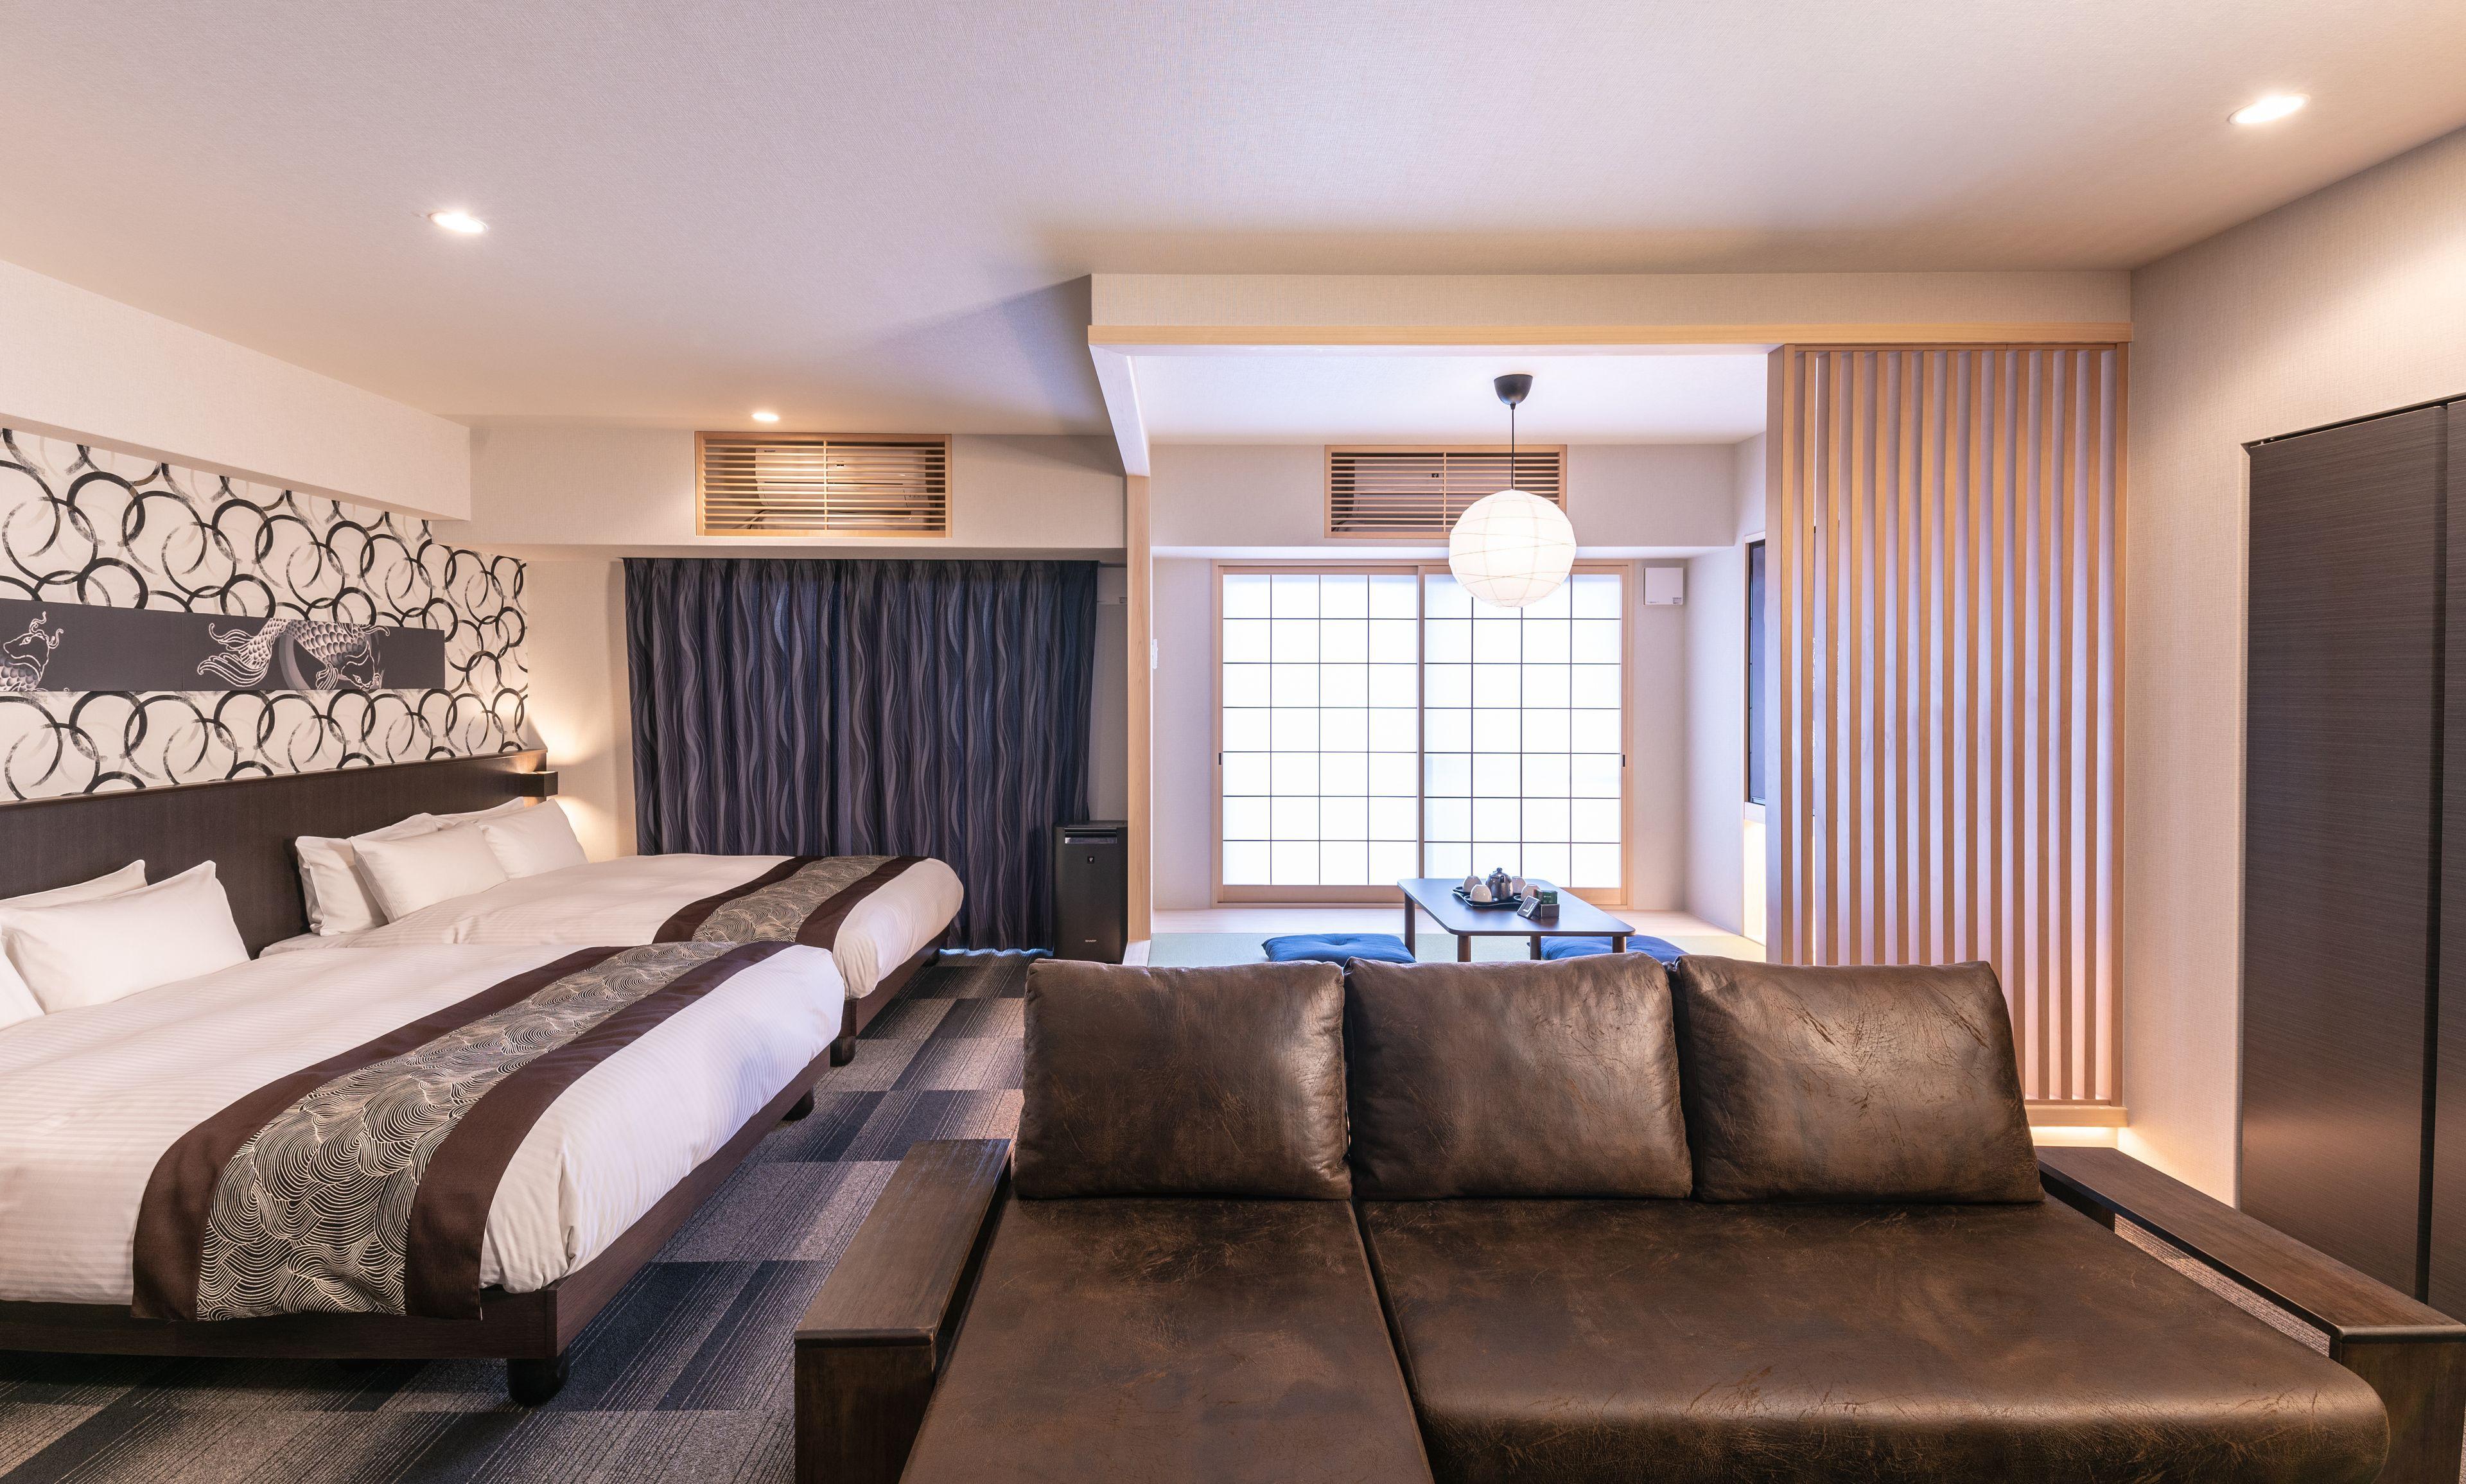 Courtesy of Zen Kyoto Apartment Hotel / Expedia